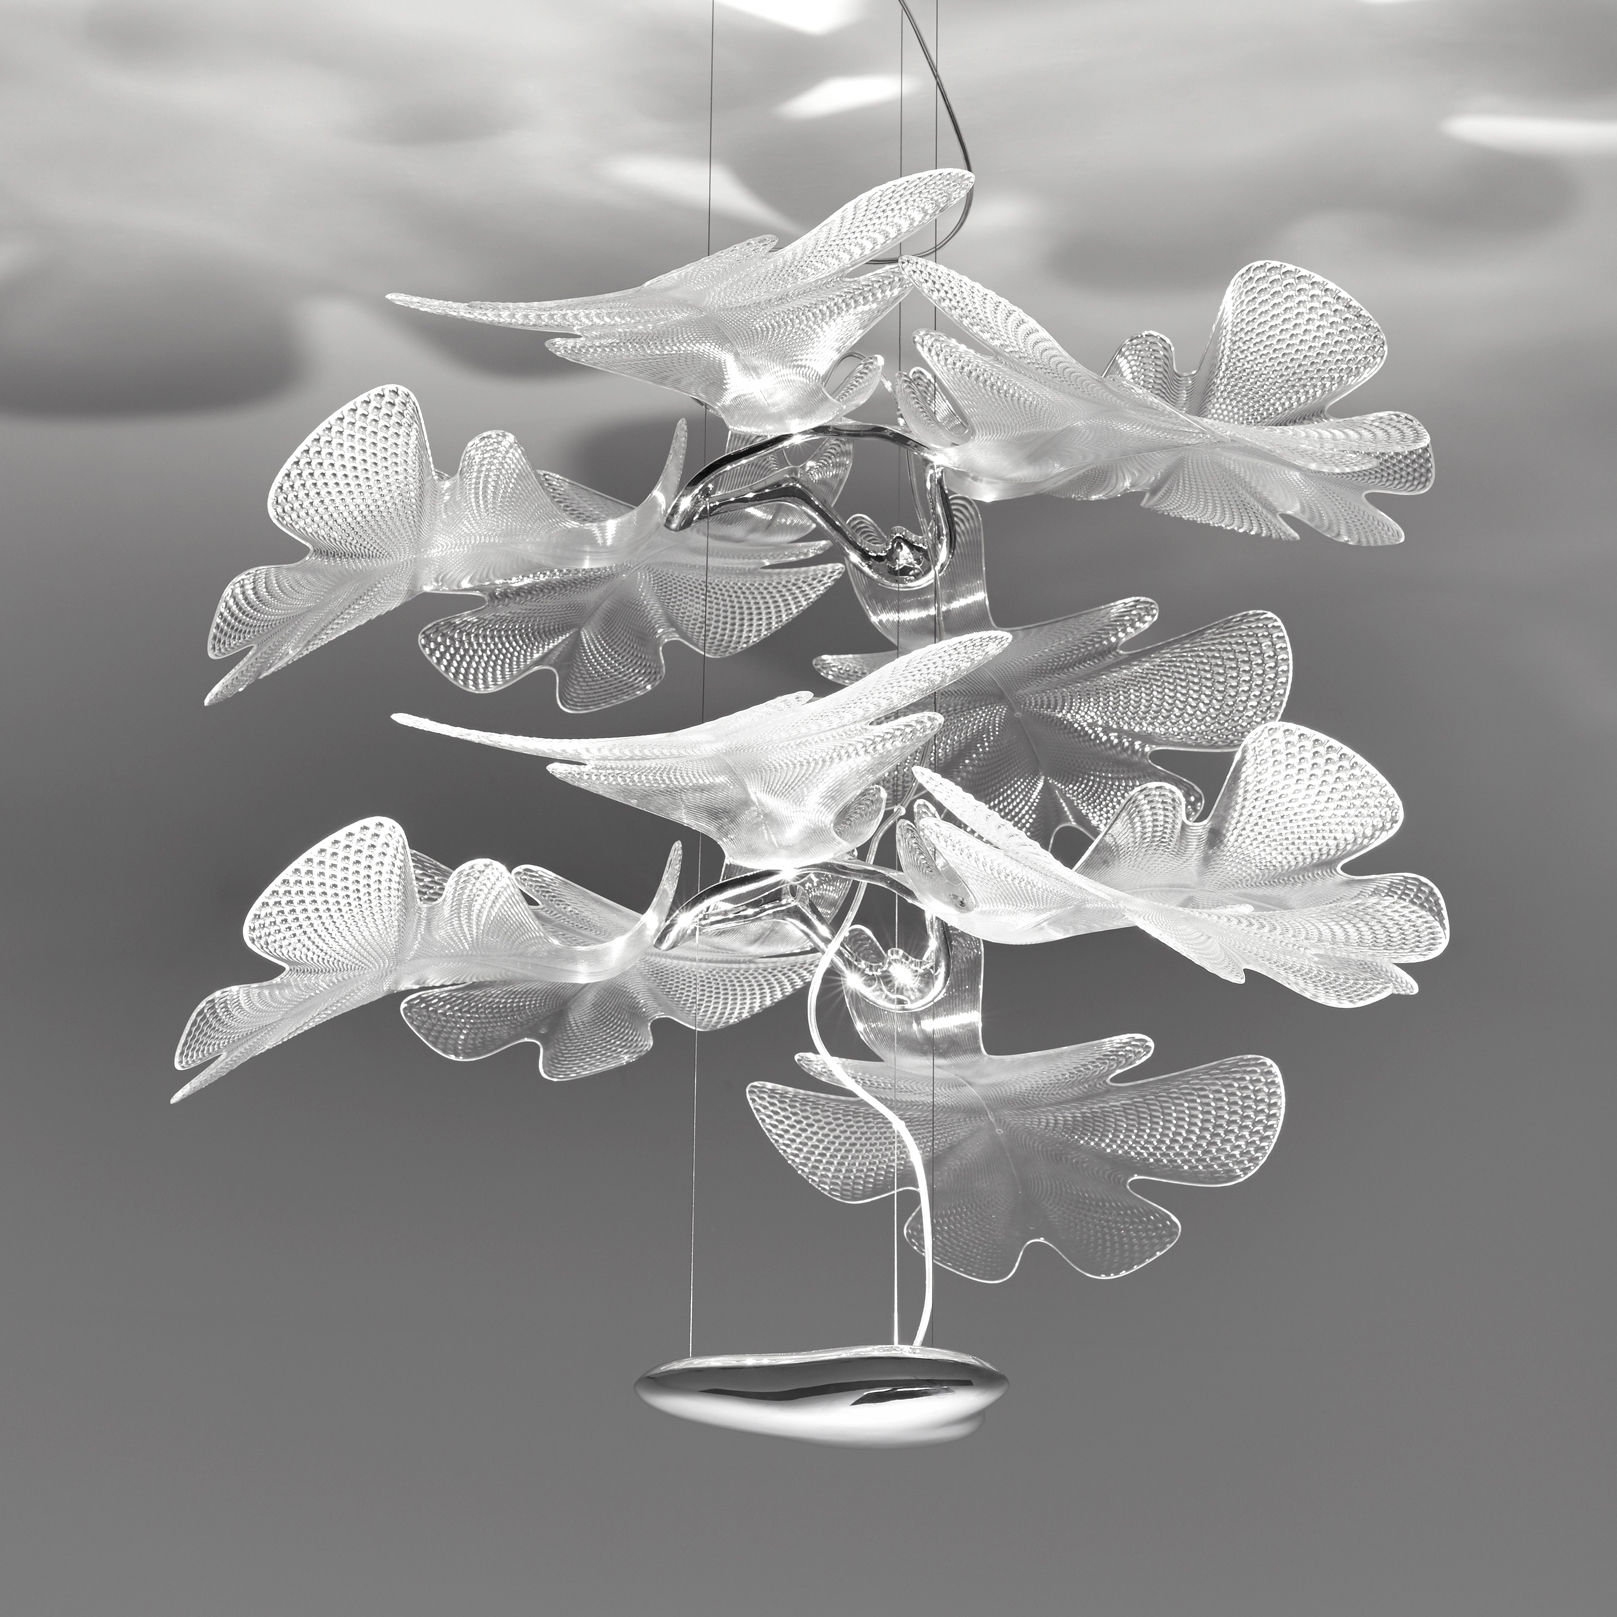 Lighting - Pendant Lighting - Chlorophilia Double Pendant - LED - Ø 78 x H 66 cm by Artemide - Transparent - Aluminium, PMMA